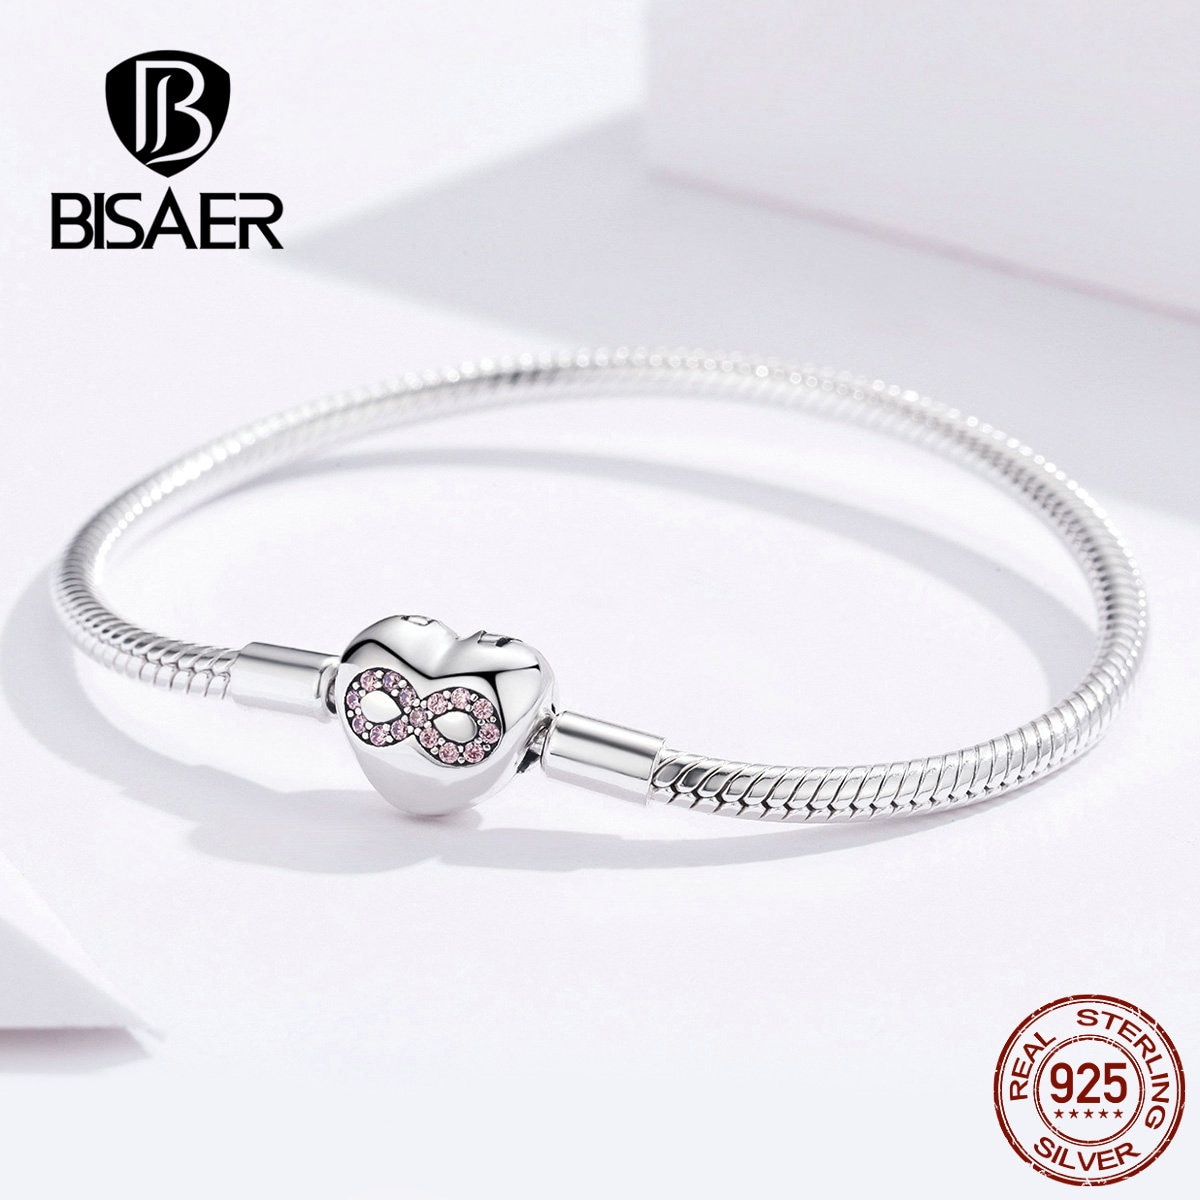 BISAER 925 Plata de ley con forma de corazón cierre infinito amor infinito Femme pulseras de plata para mujer joyería Pulseira ECB142